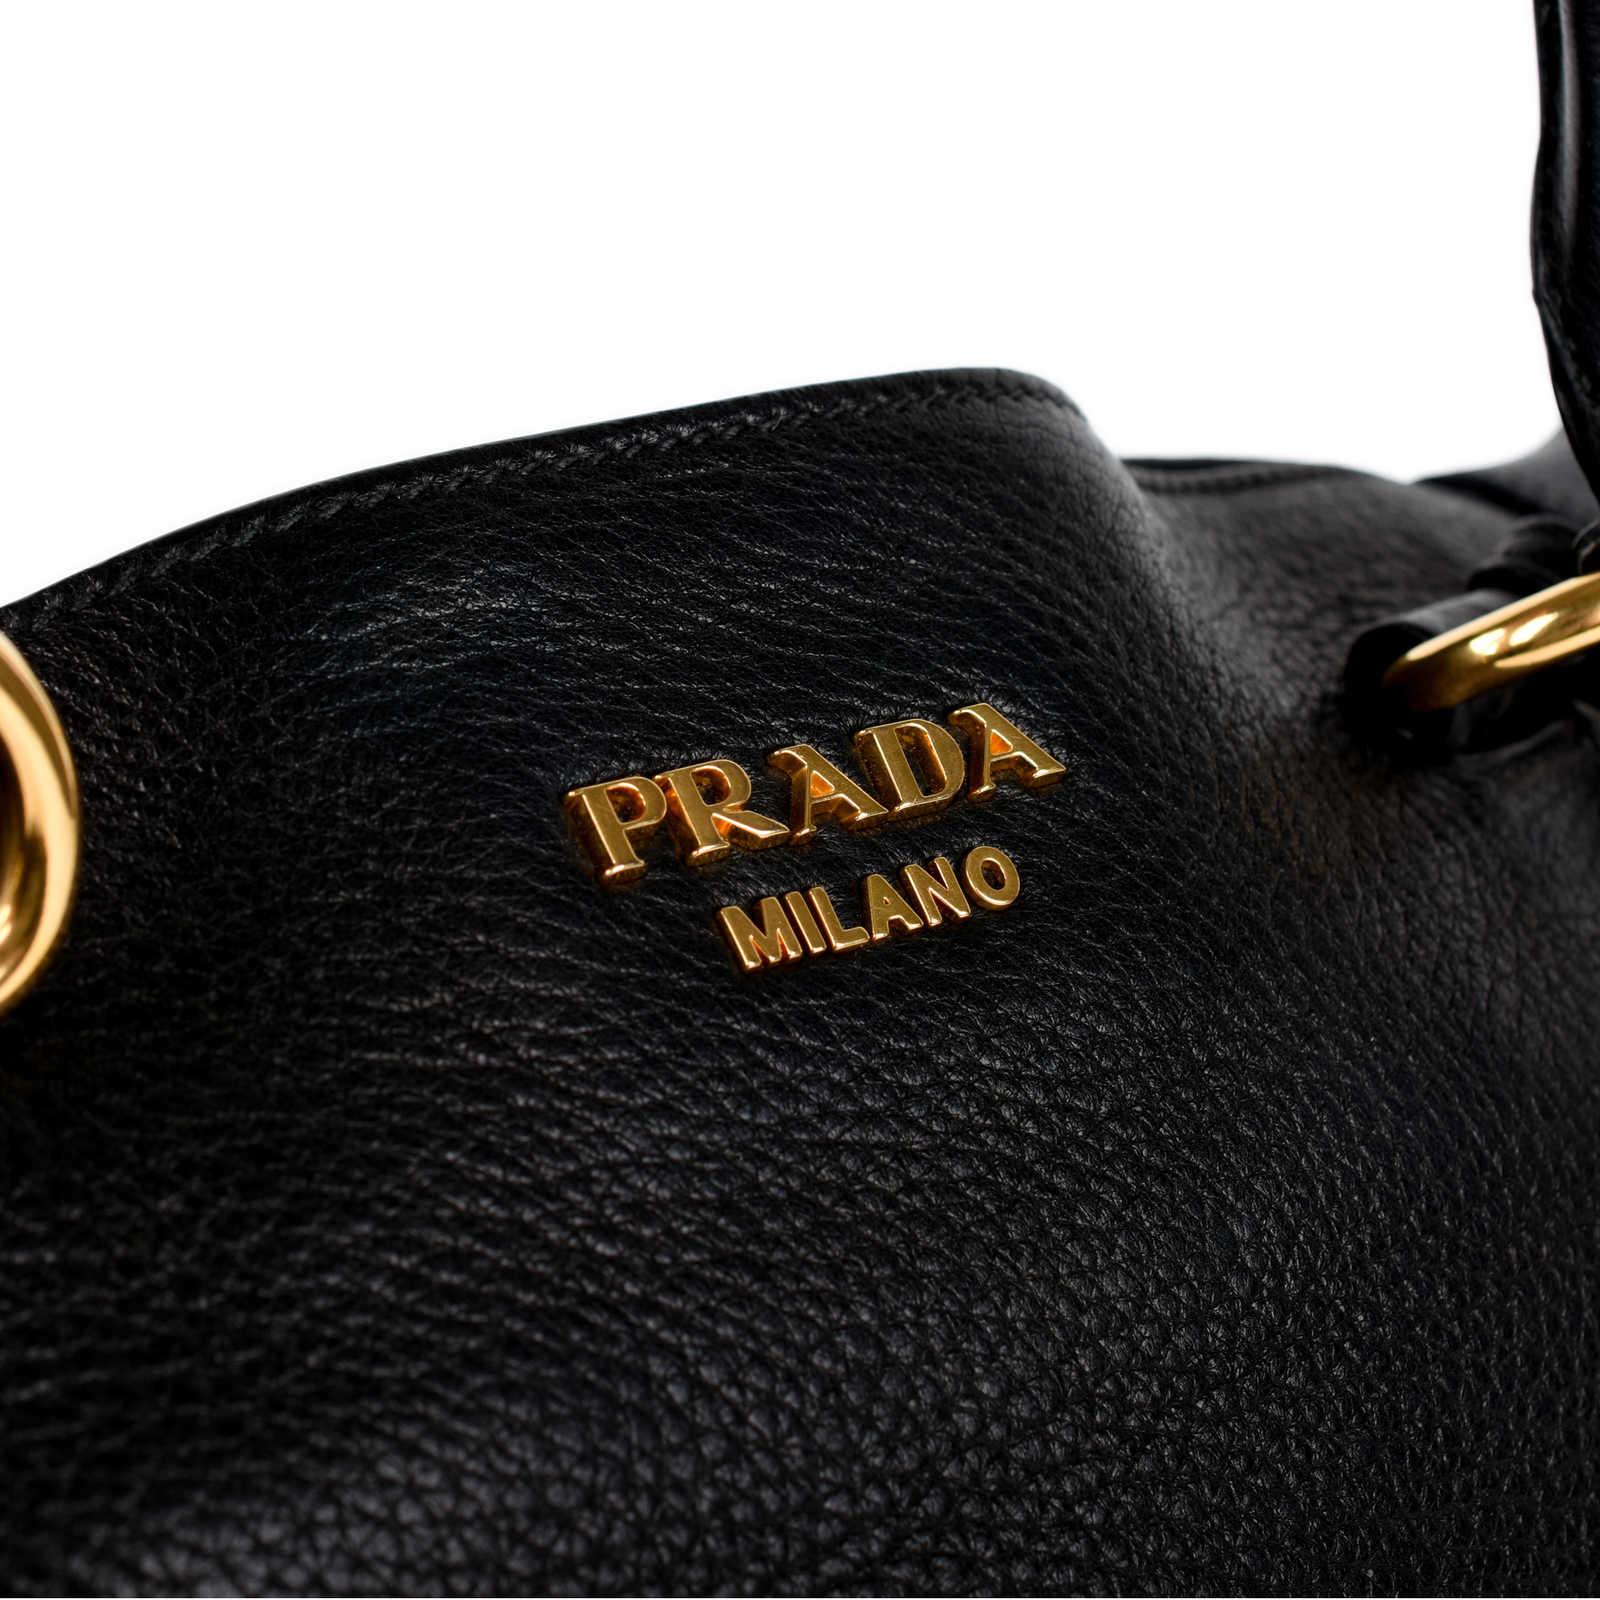 2e227f5ca815 free shipping prada milano tote bag 46225 15a32